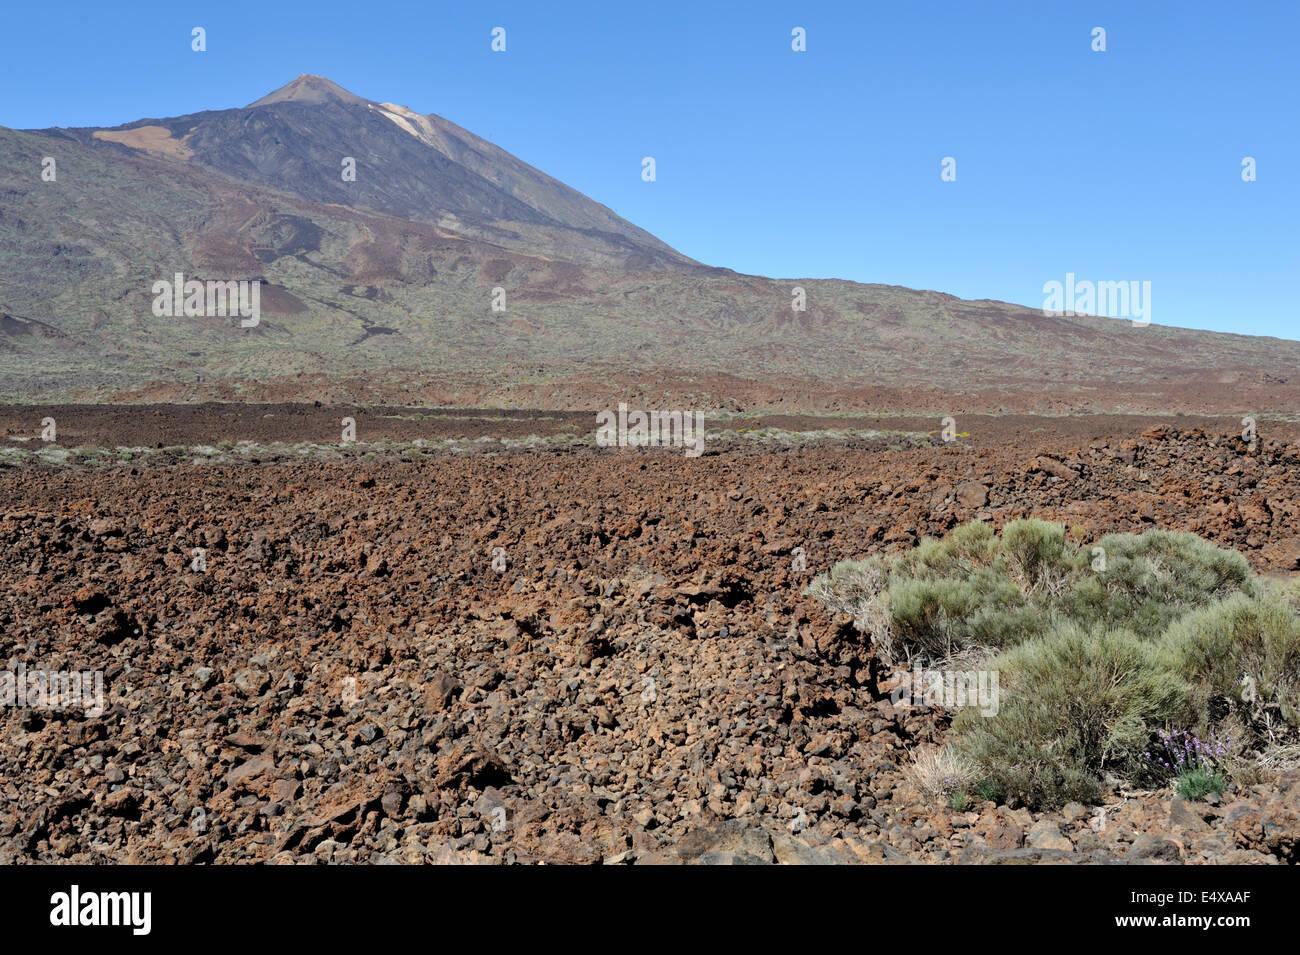 Mount Teide Vulkan Nationalpark mit Lavastrom im Vordergrund, Teneriffa Stockbild